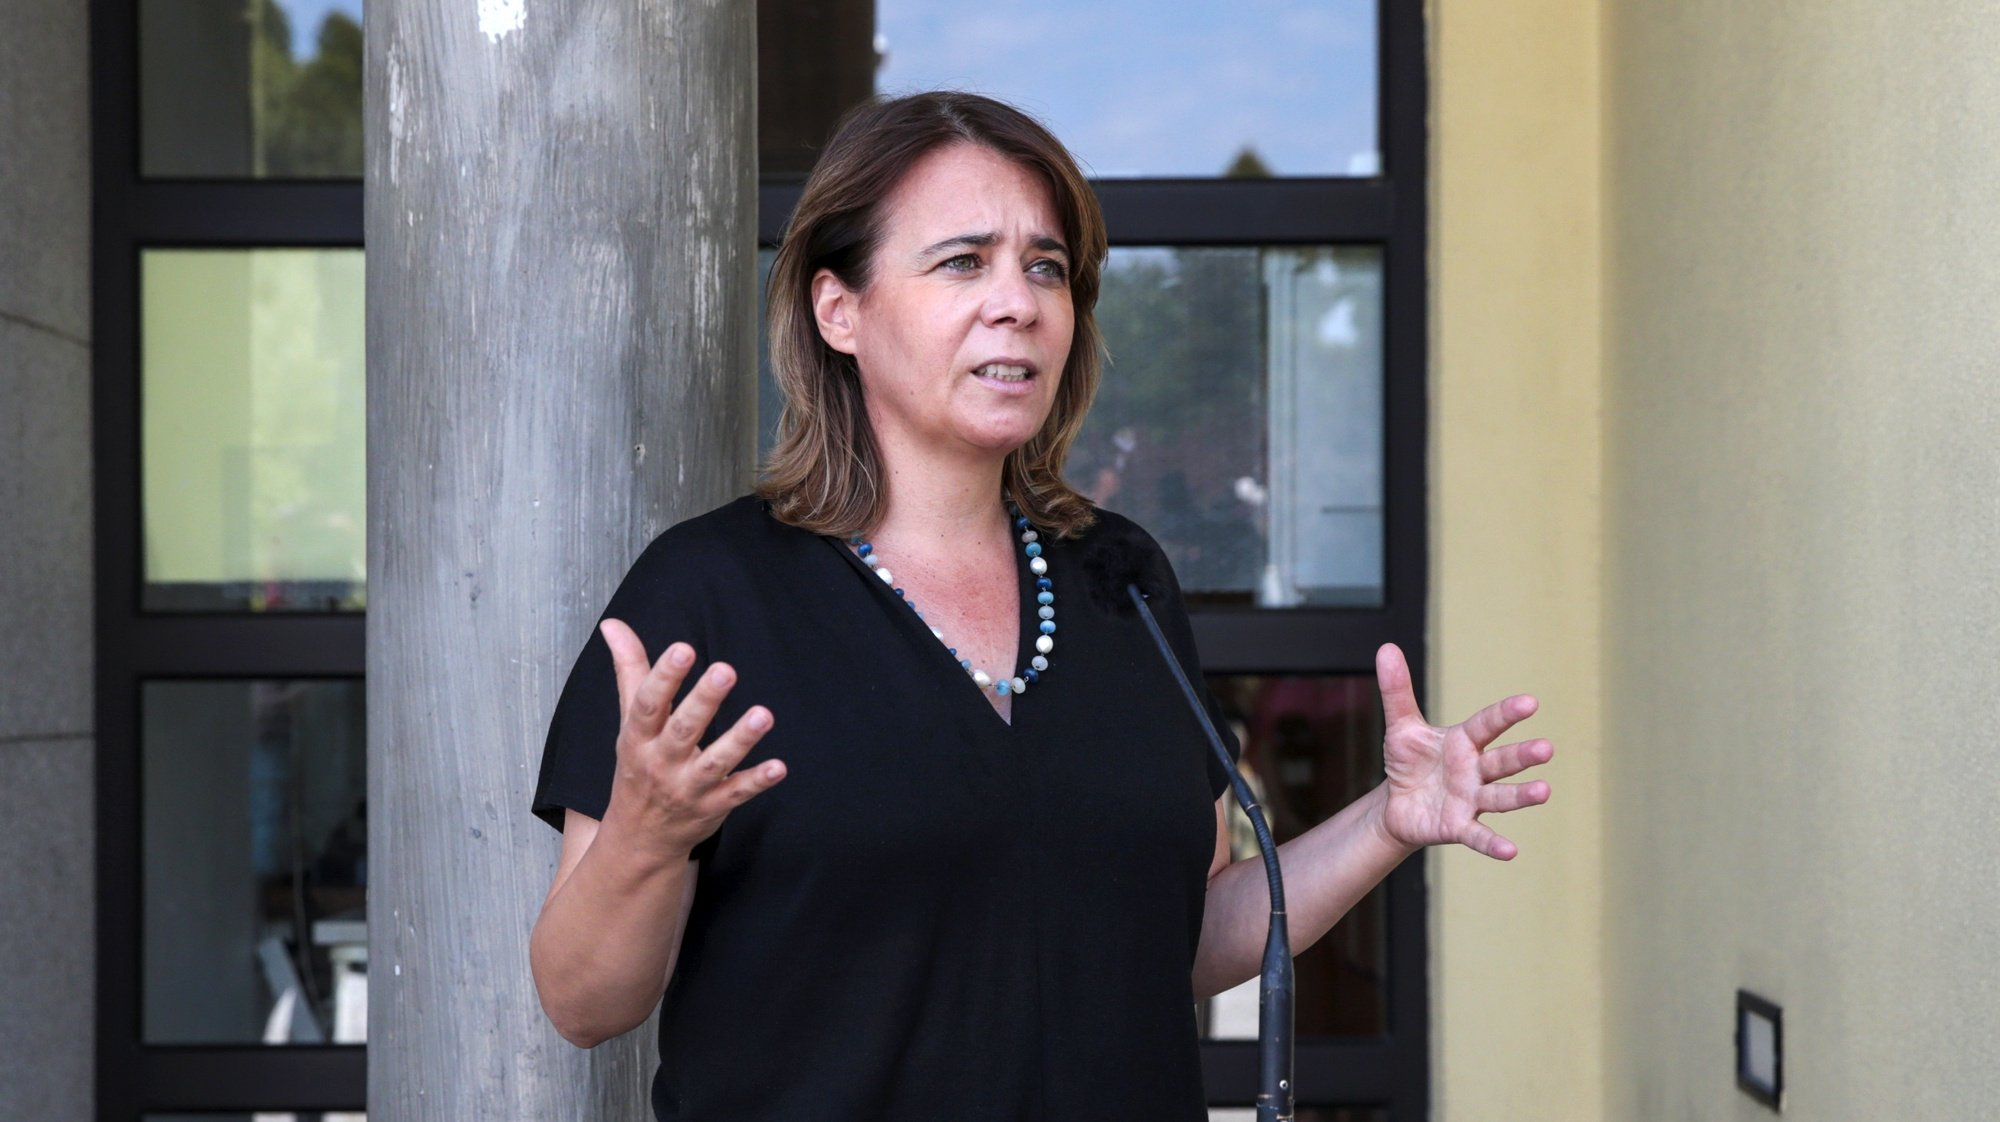 A coordenadora do Bloco de Esquerda (BE), Catarina Martins, fala aos jornalistas esta manhã, após ter visitado o Centro de Saúde de Cubos, em Mangualde, 25 de agosto de 2021. NUNO ANDRÉ FERREIRA/LUSA